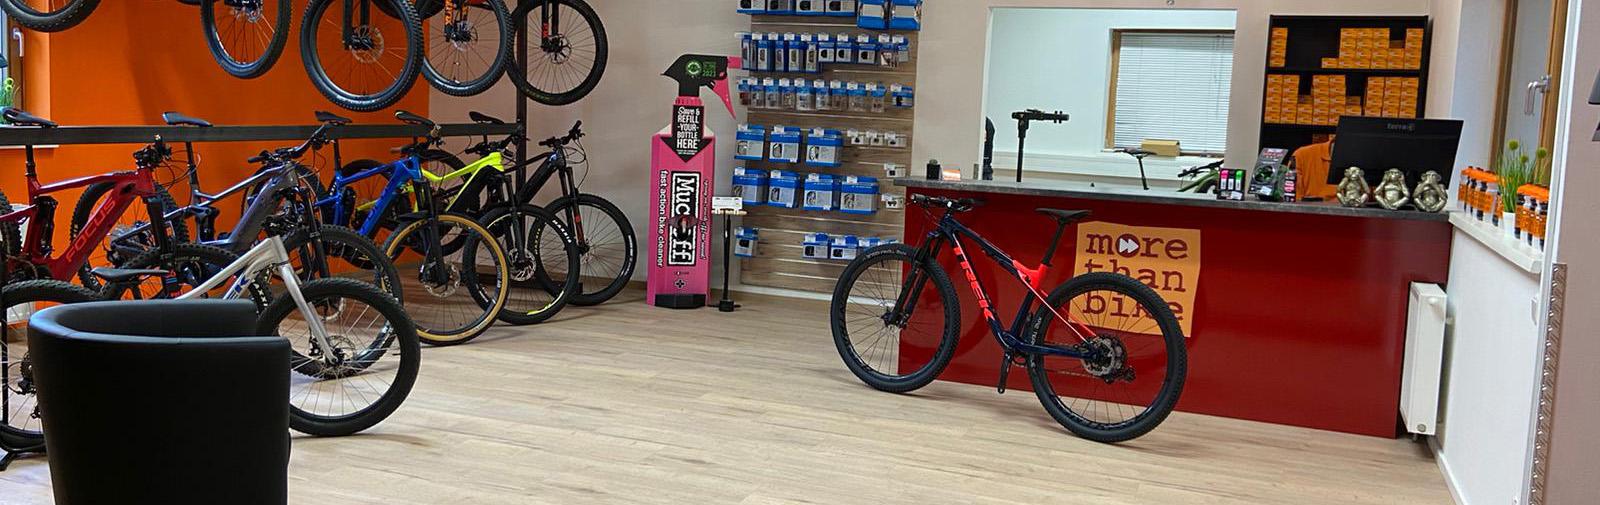 morethanbike Shop und Verleih Hohe Wand Wiese